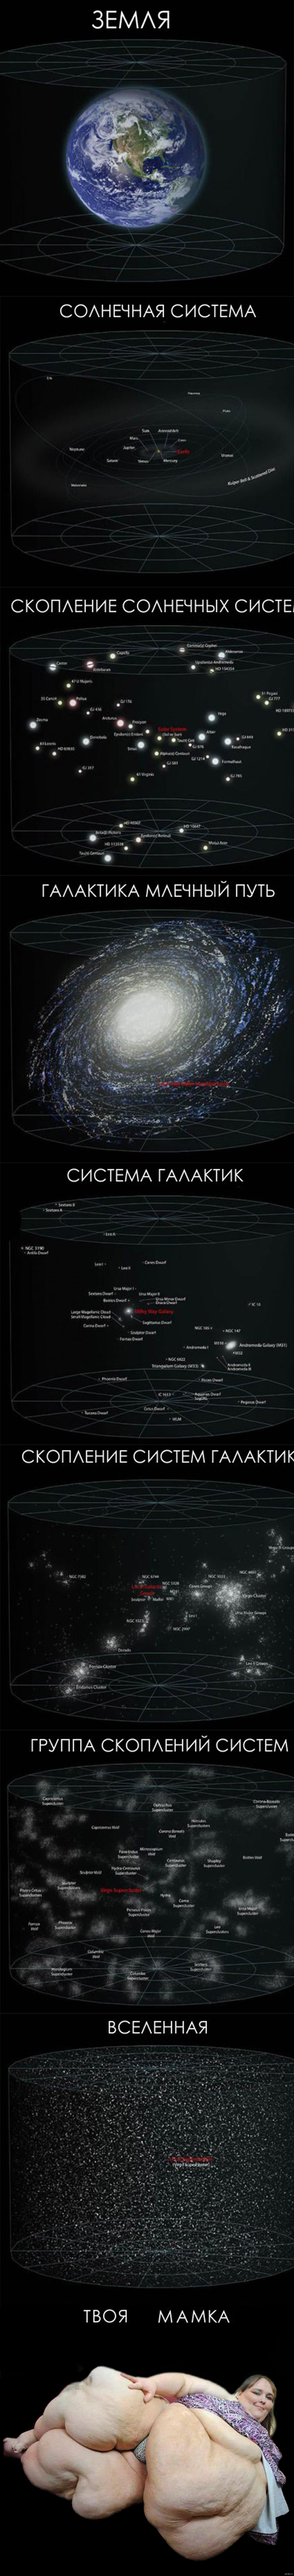 virgo supercluster location in the universe - 300×2707